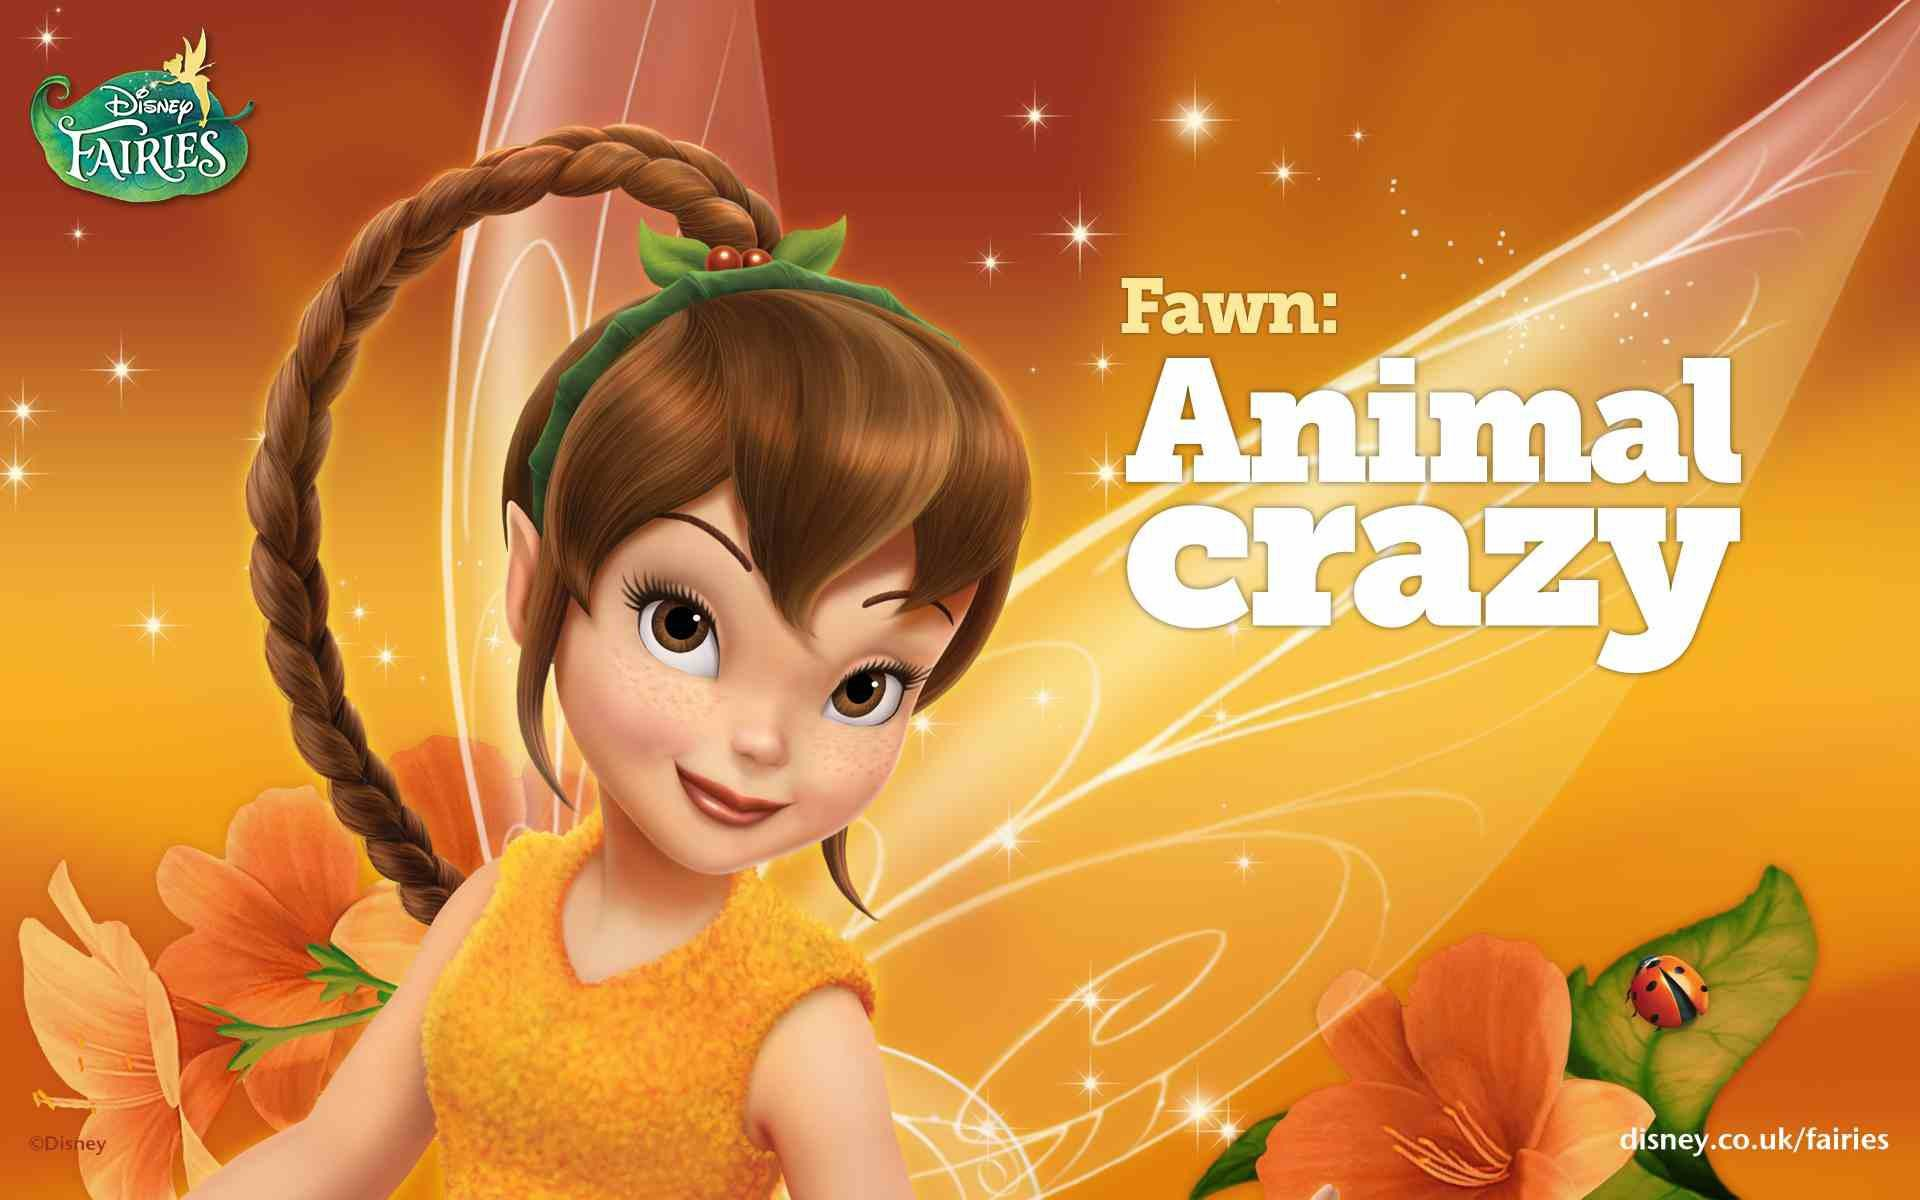 Res: 1920x1200, Disney Fairies Fawn Animal crazy.jpg